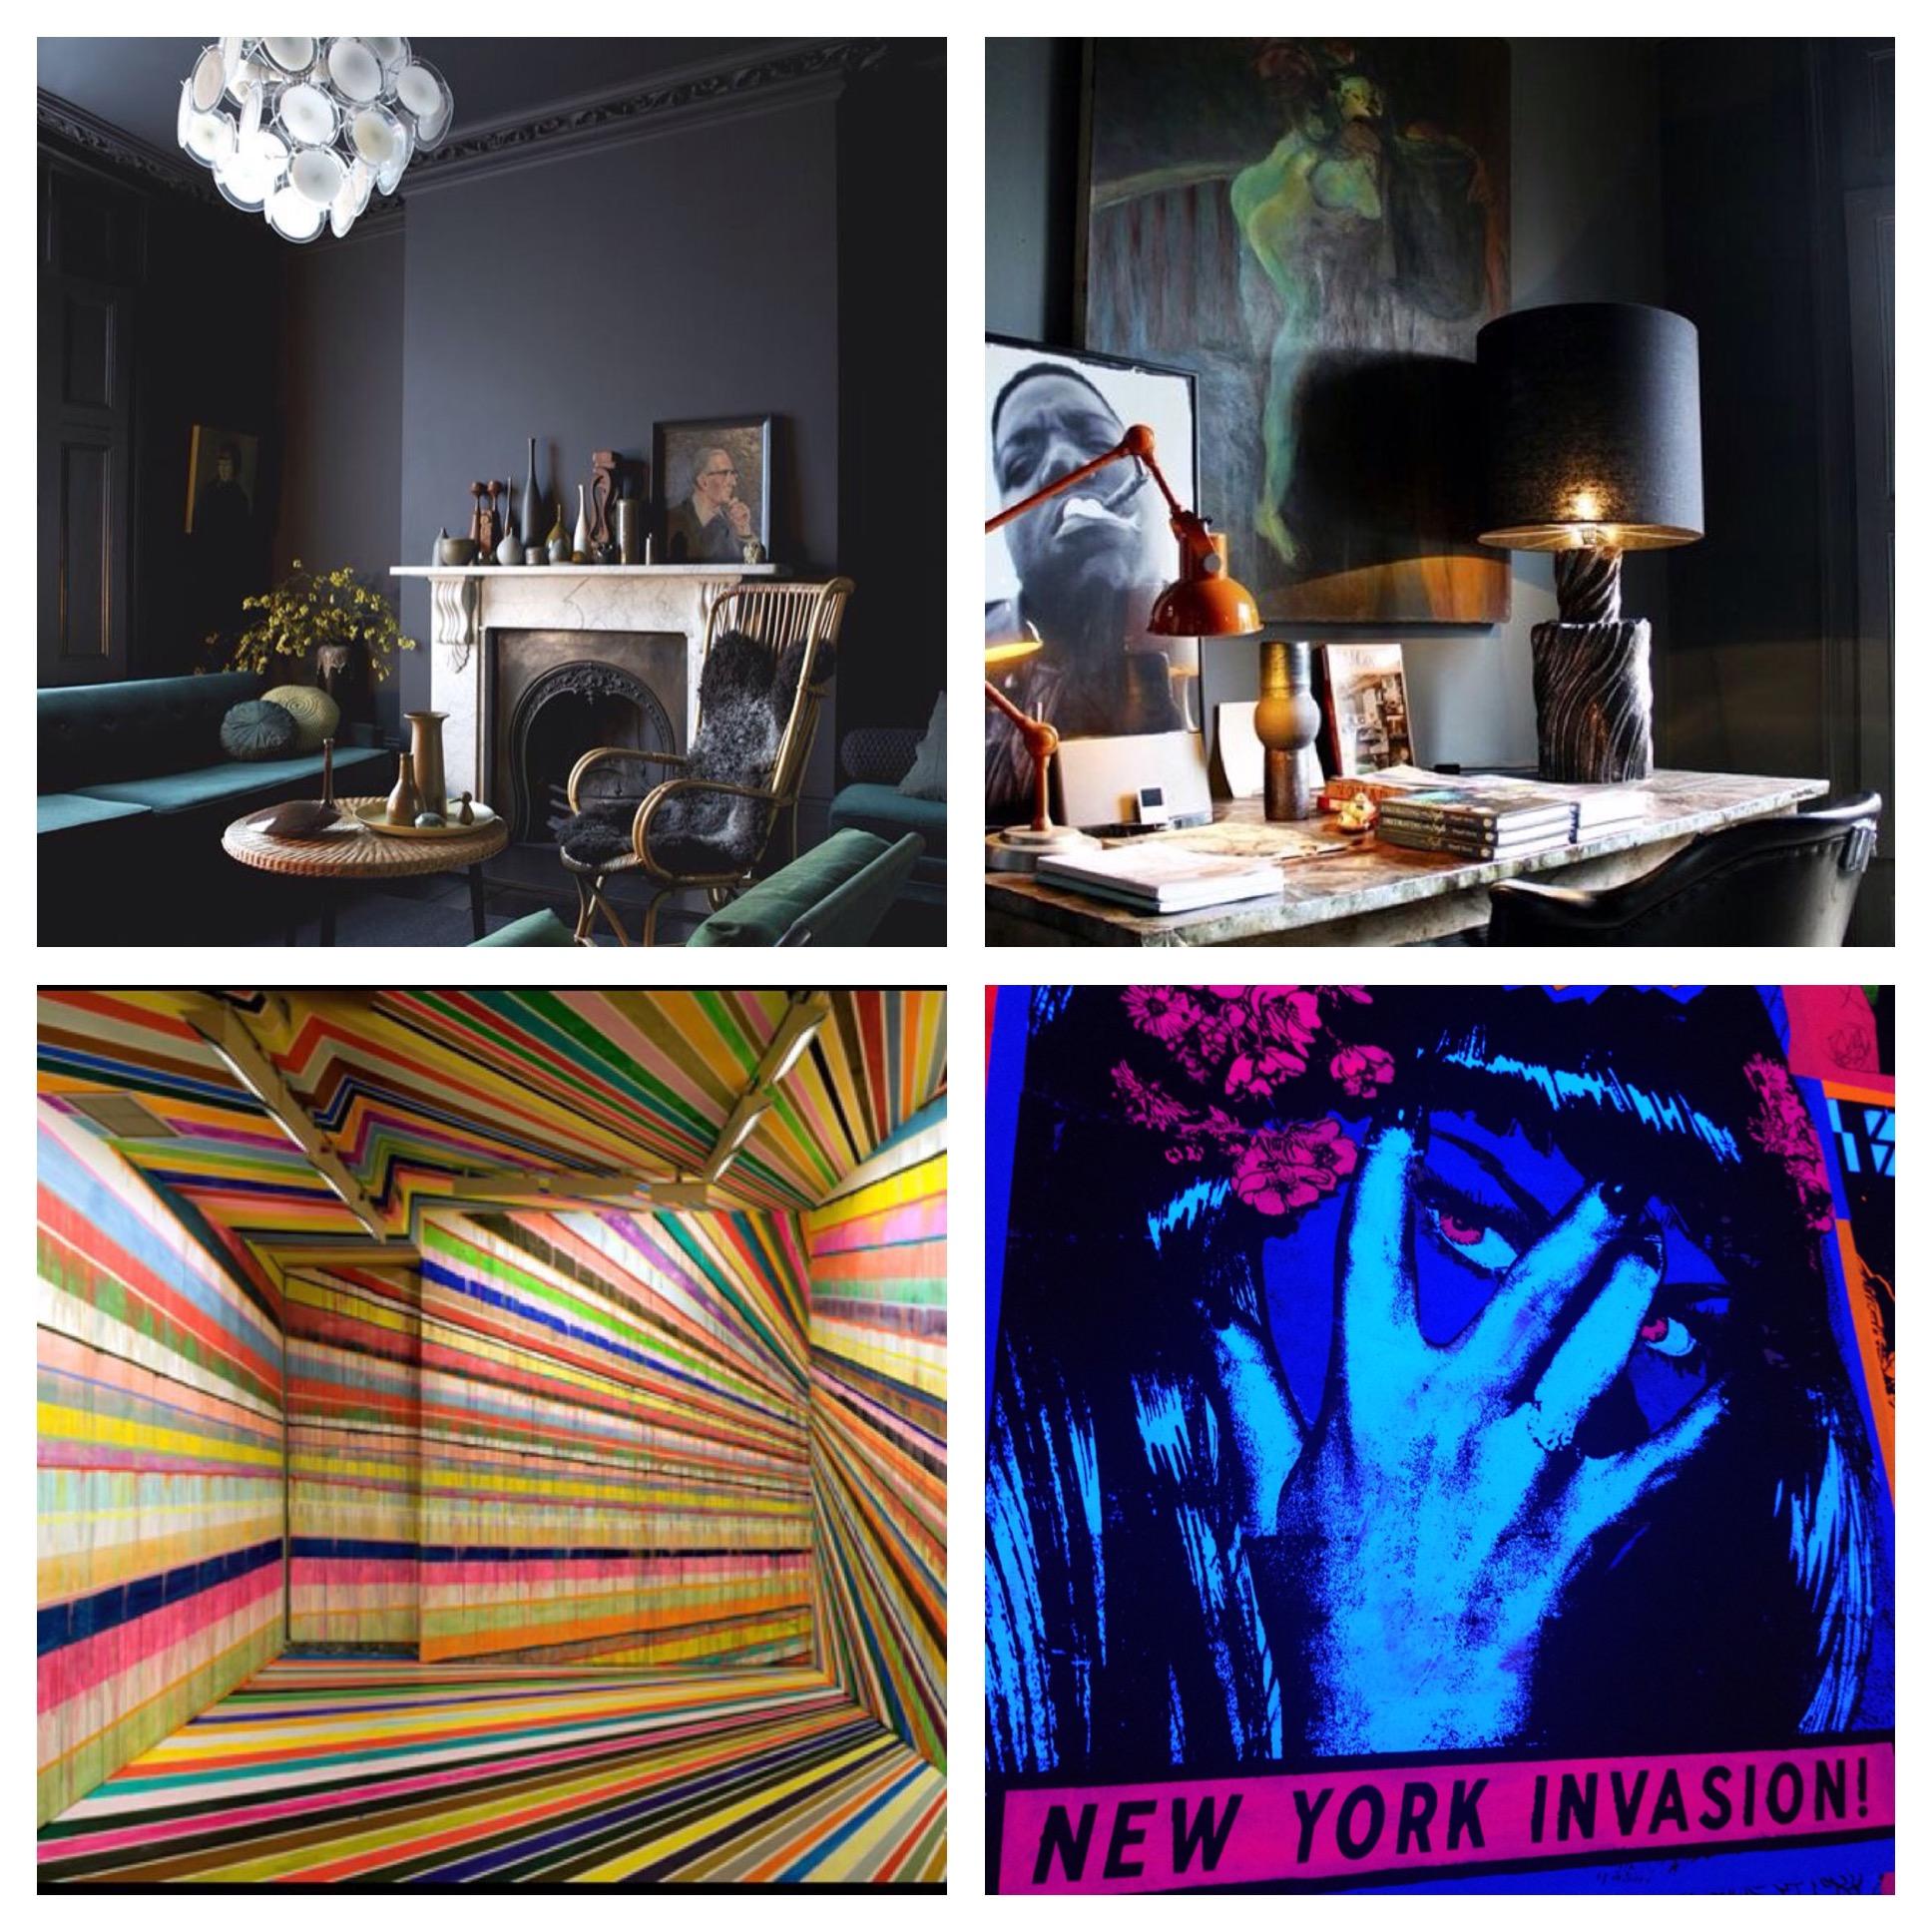 Top Left:  Credit- Graham Atkins Hughes   Top Right:  Designer Abigail Ahern    Bottom Left:  Artist Markus Linnenbrink            Bottom Right:  FAILE-Brooklyn Museum Exhibit